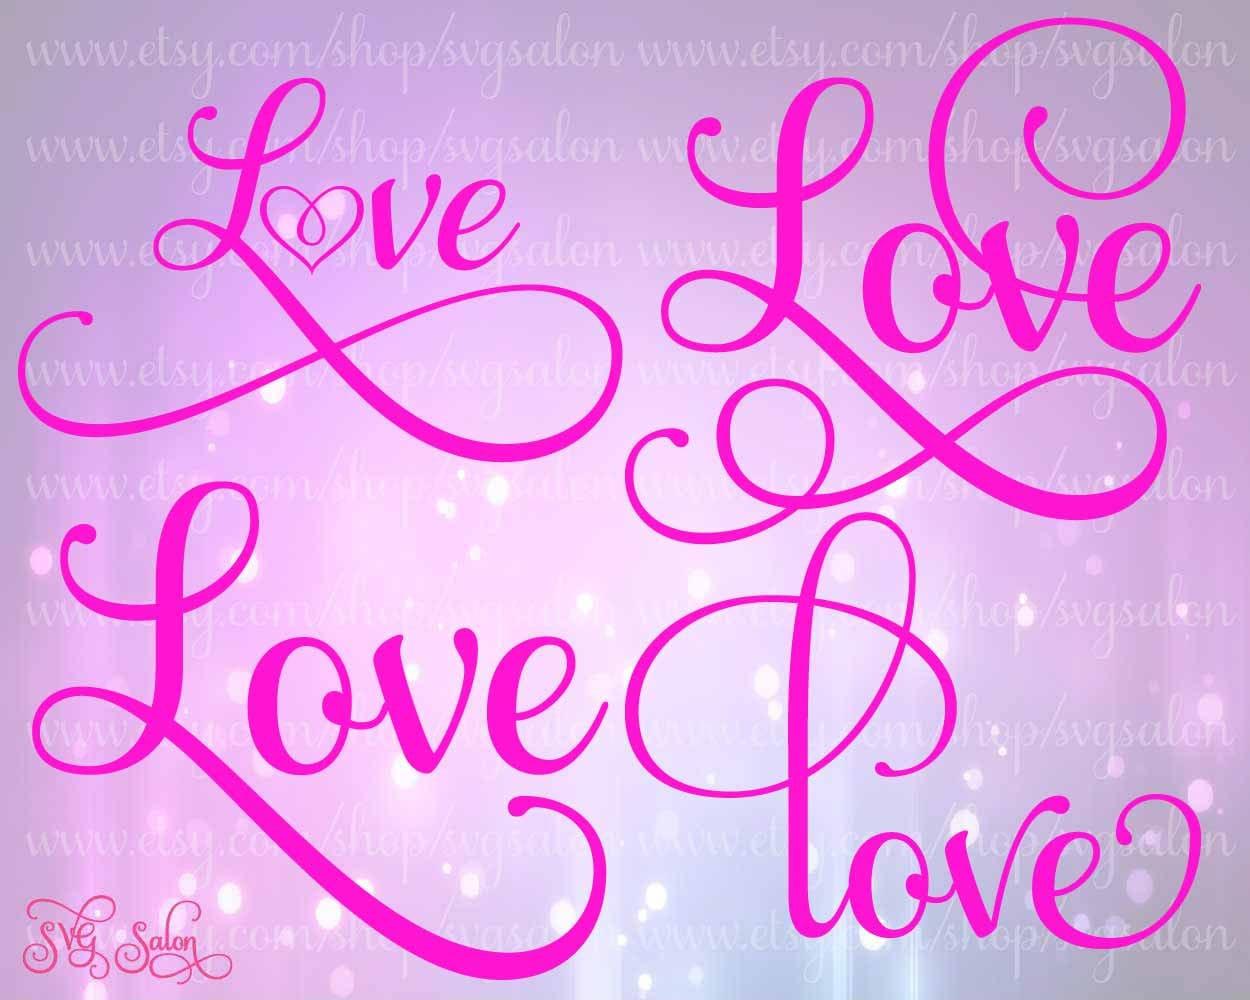 Blackberry Logo Font Love Logo in Samantha Font